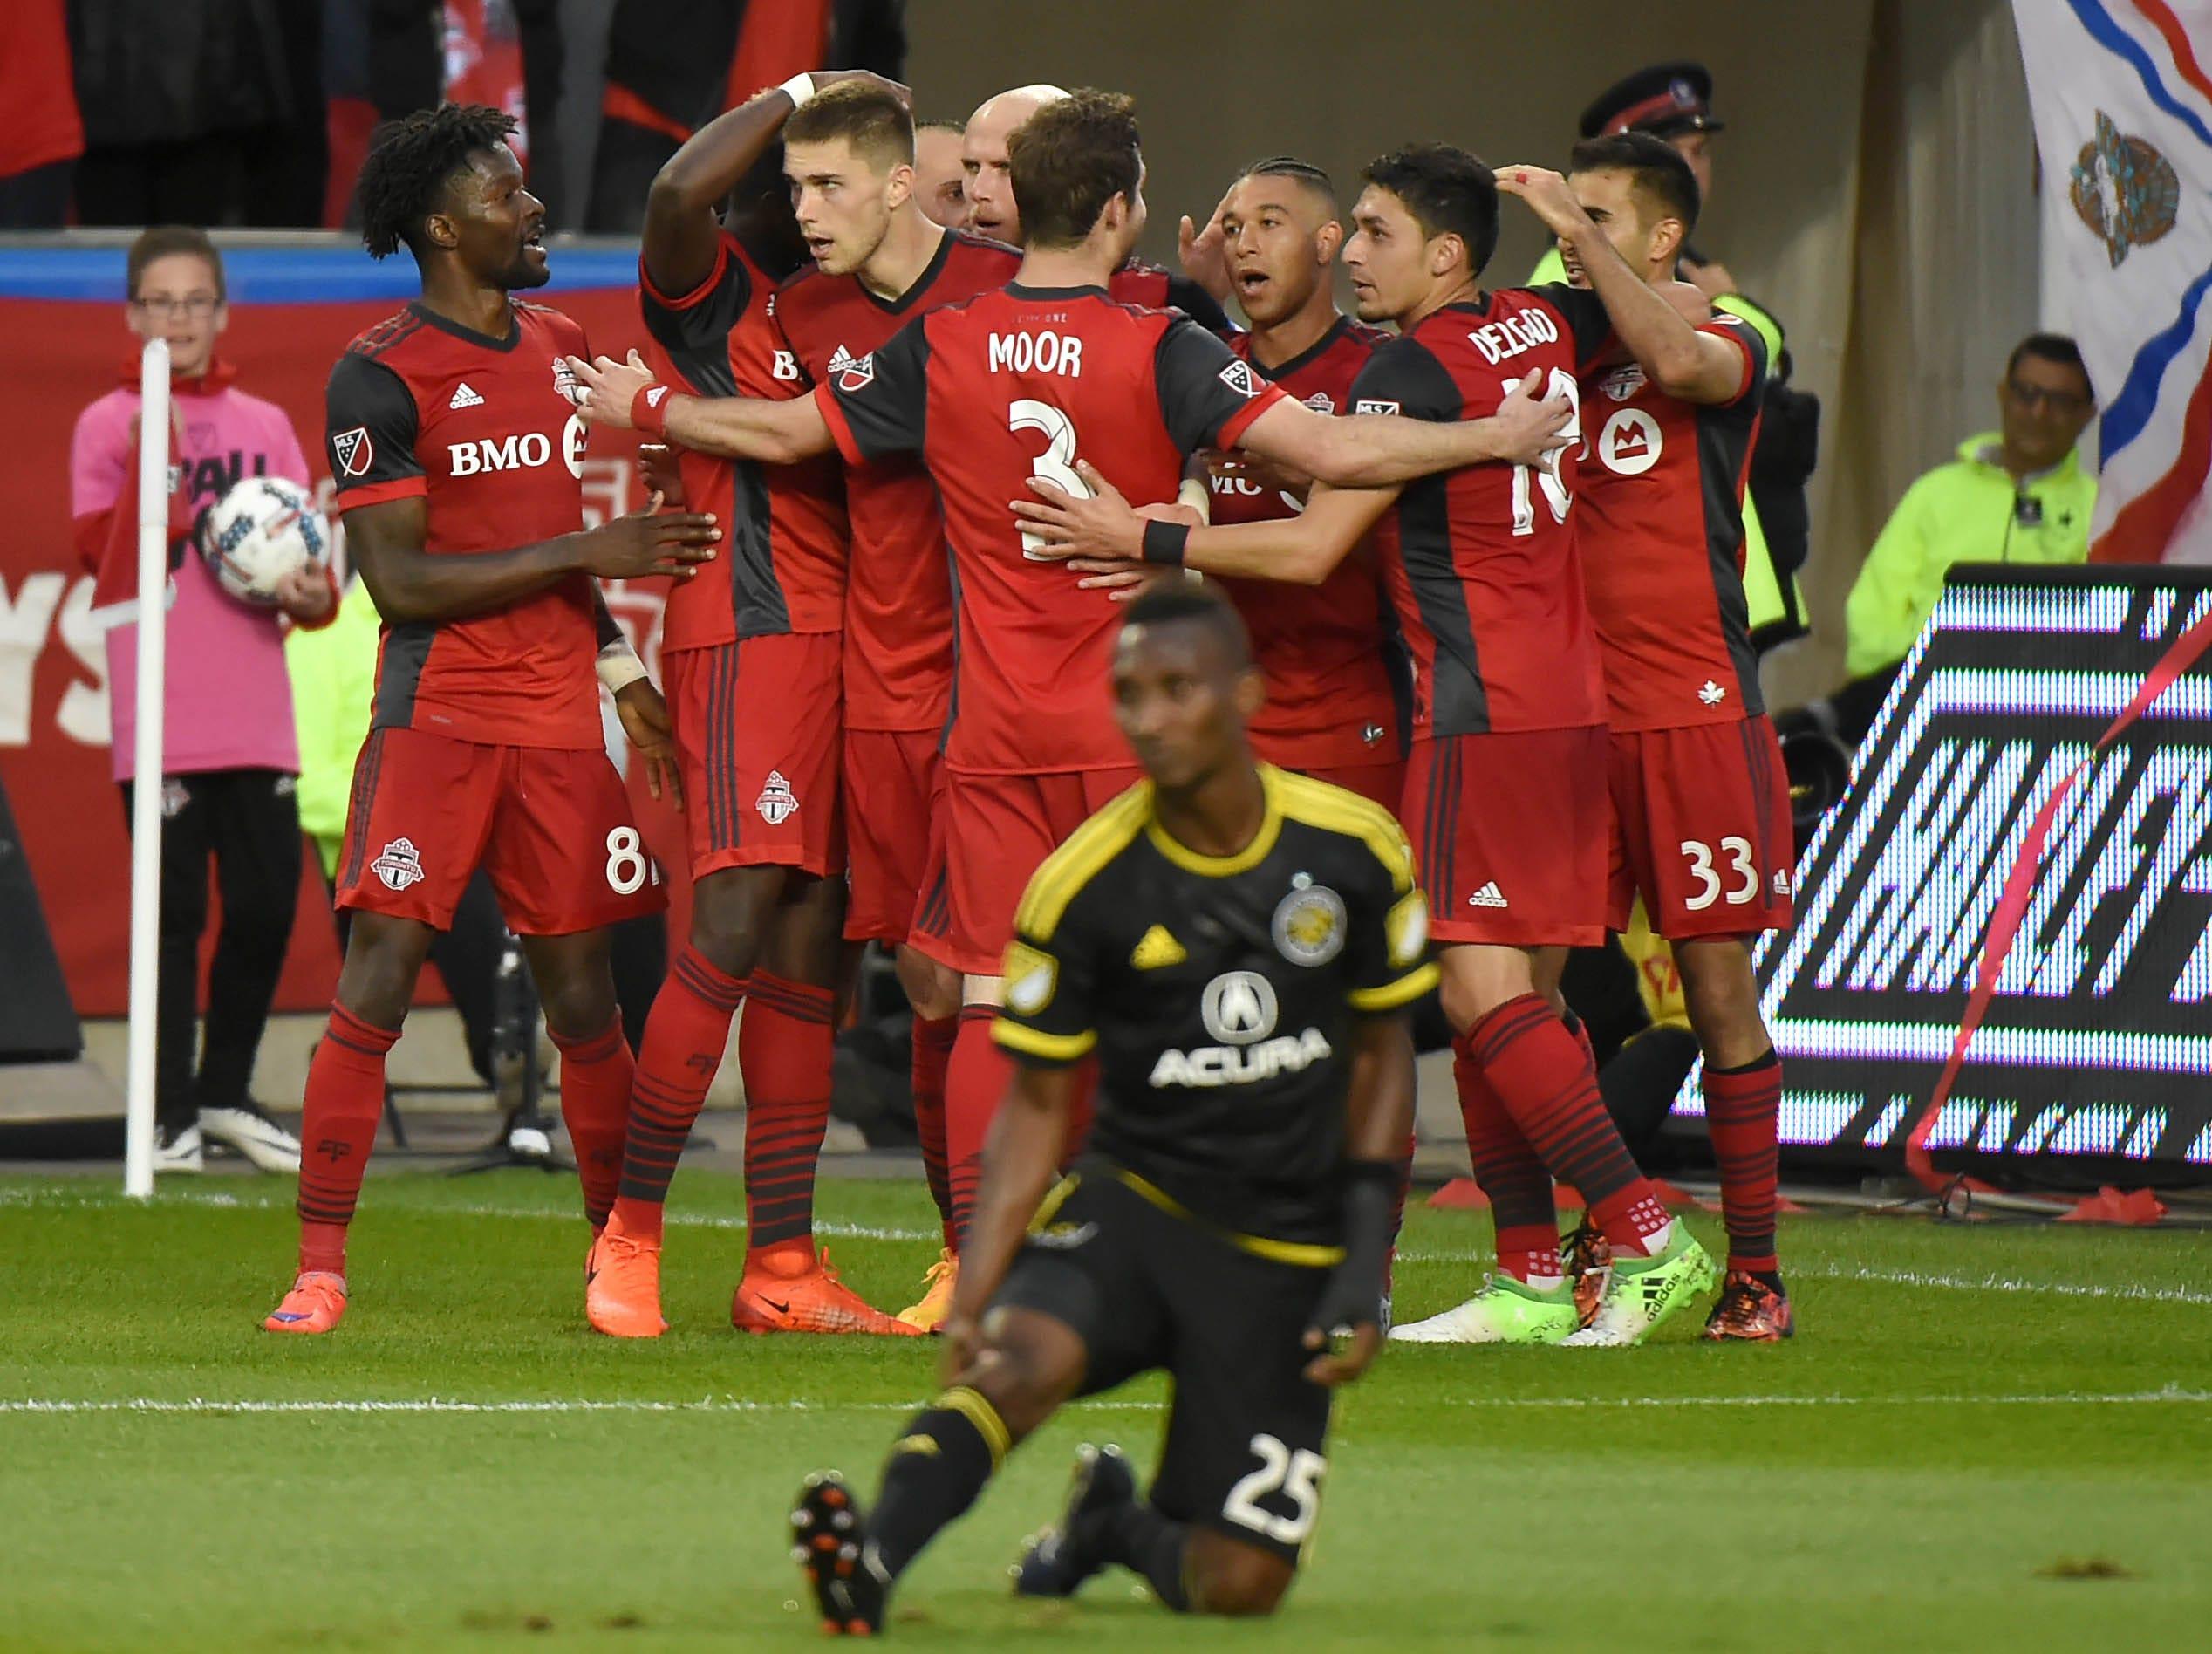 Toronto FC routs Columbus Crew to extend unbeaten streak to 8